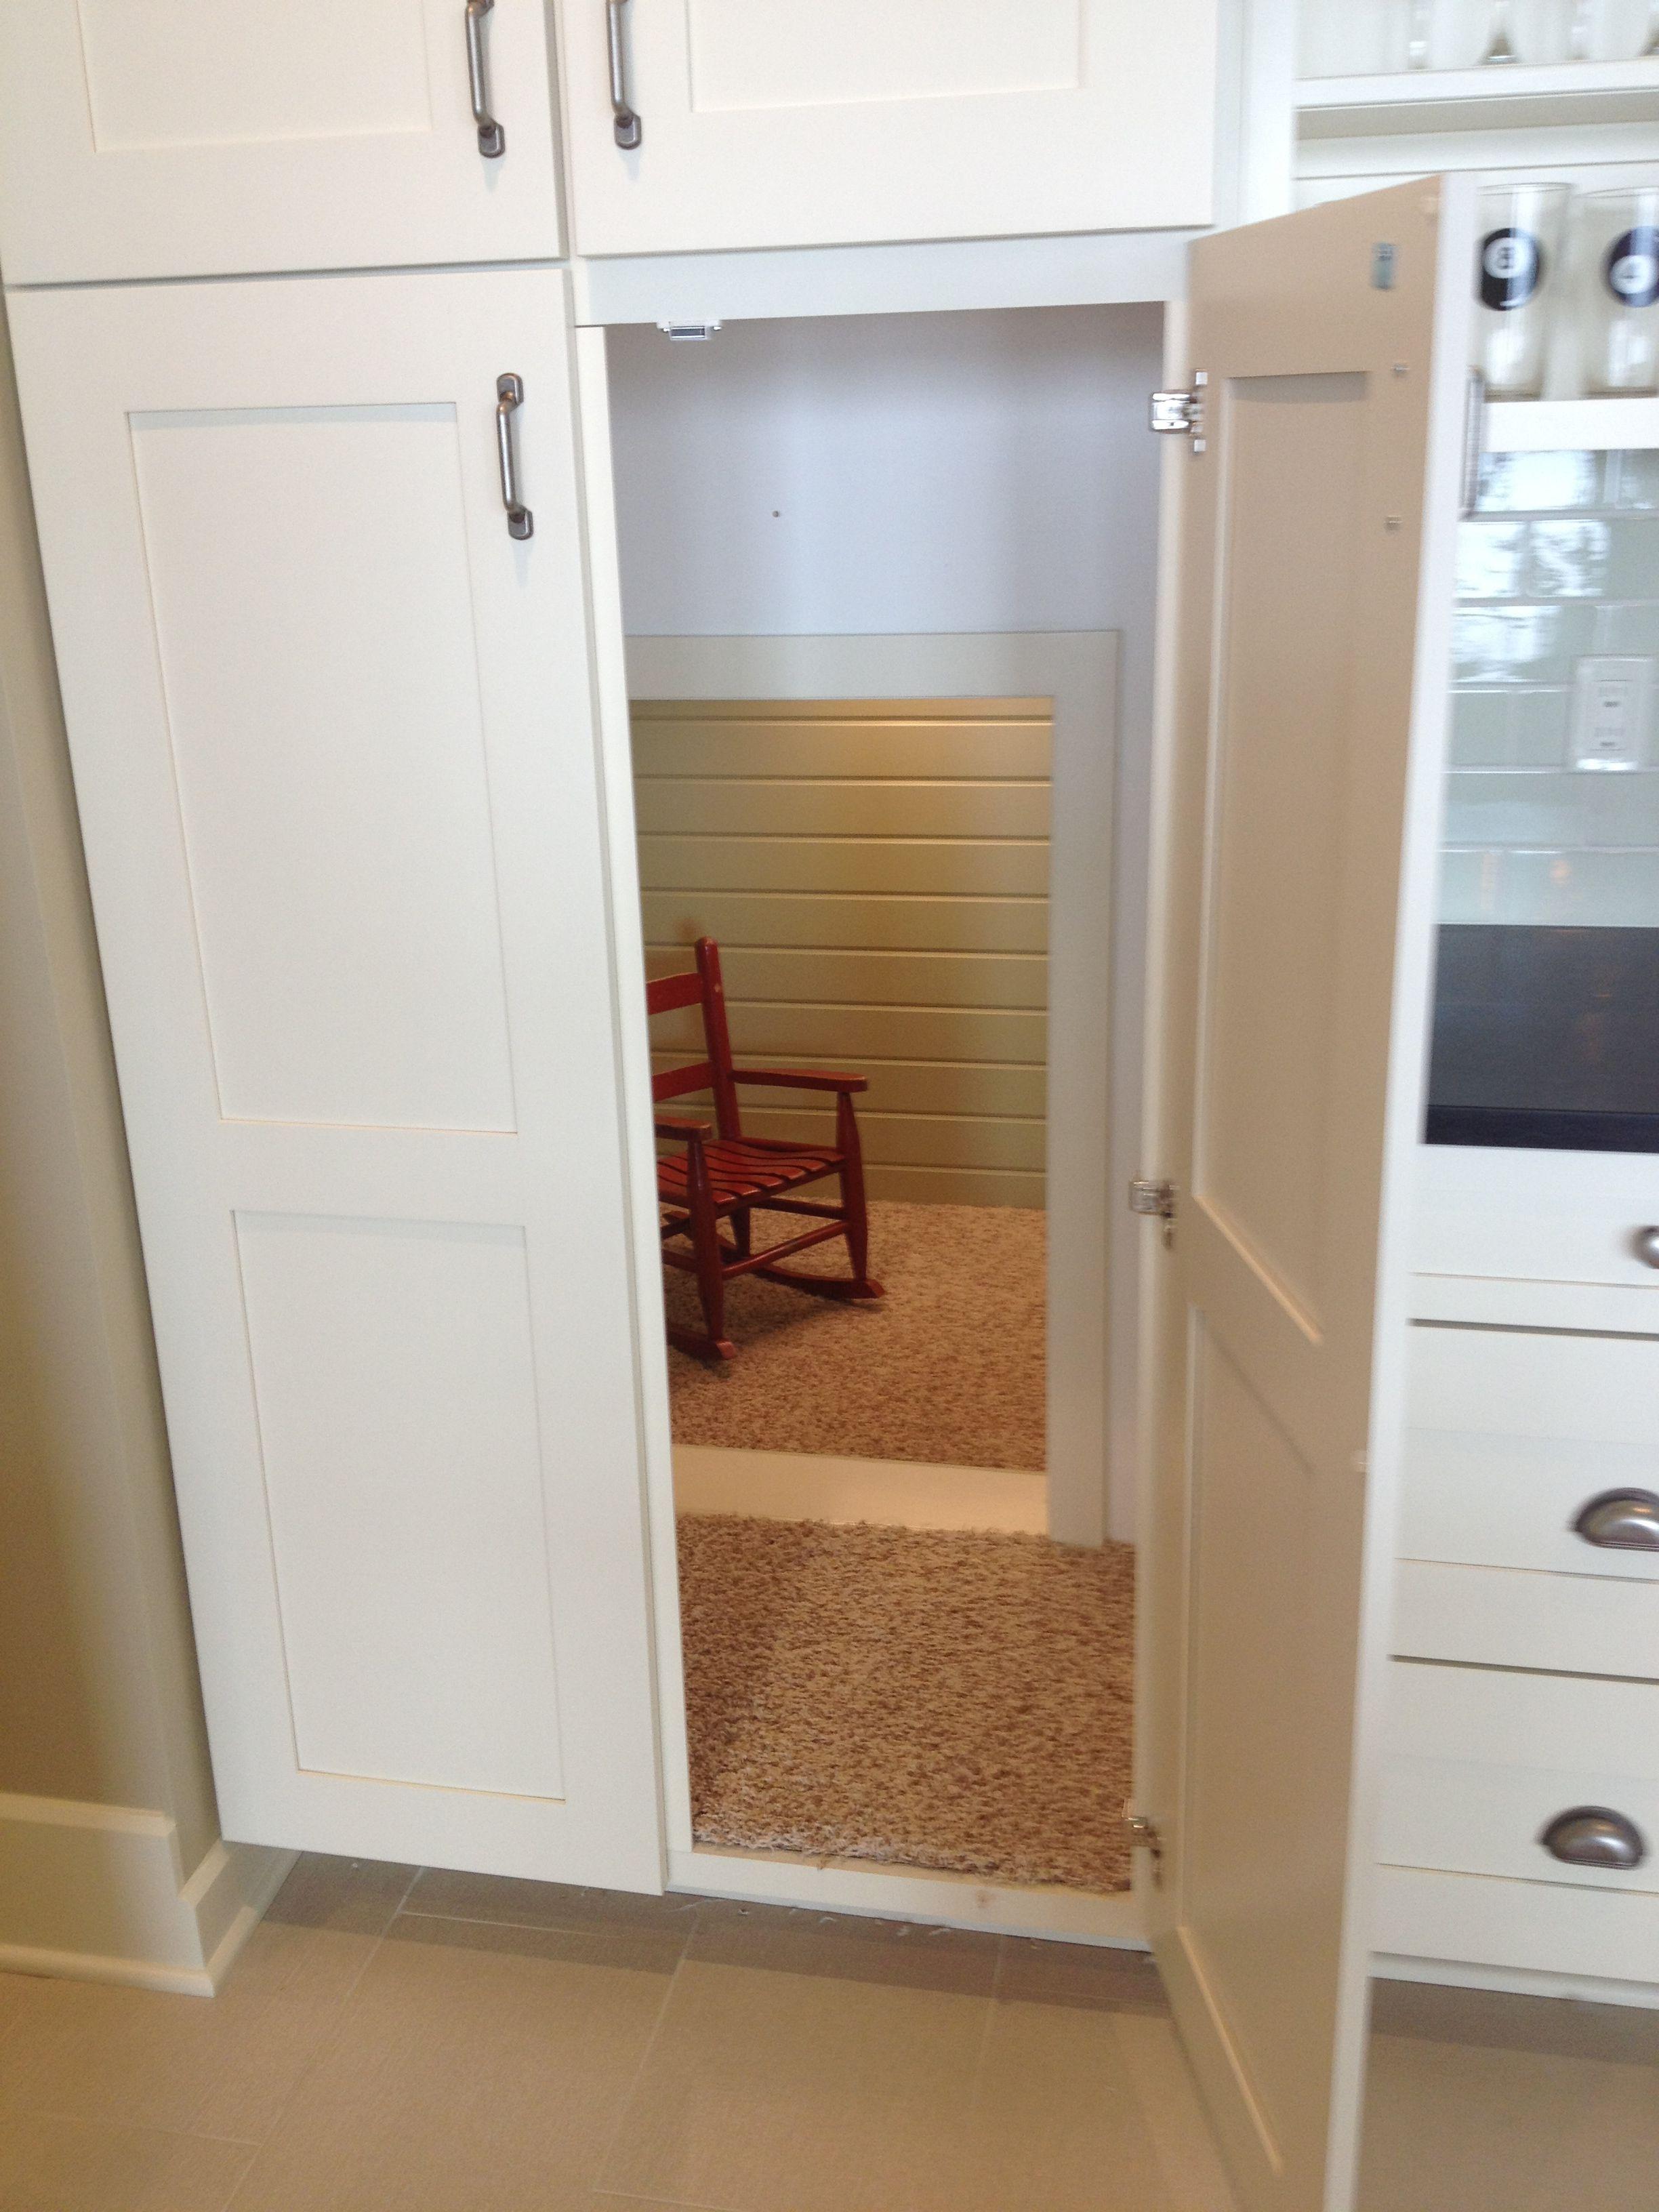 Secret room under stairs for kids hidden behind cupboards ...